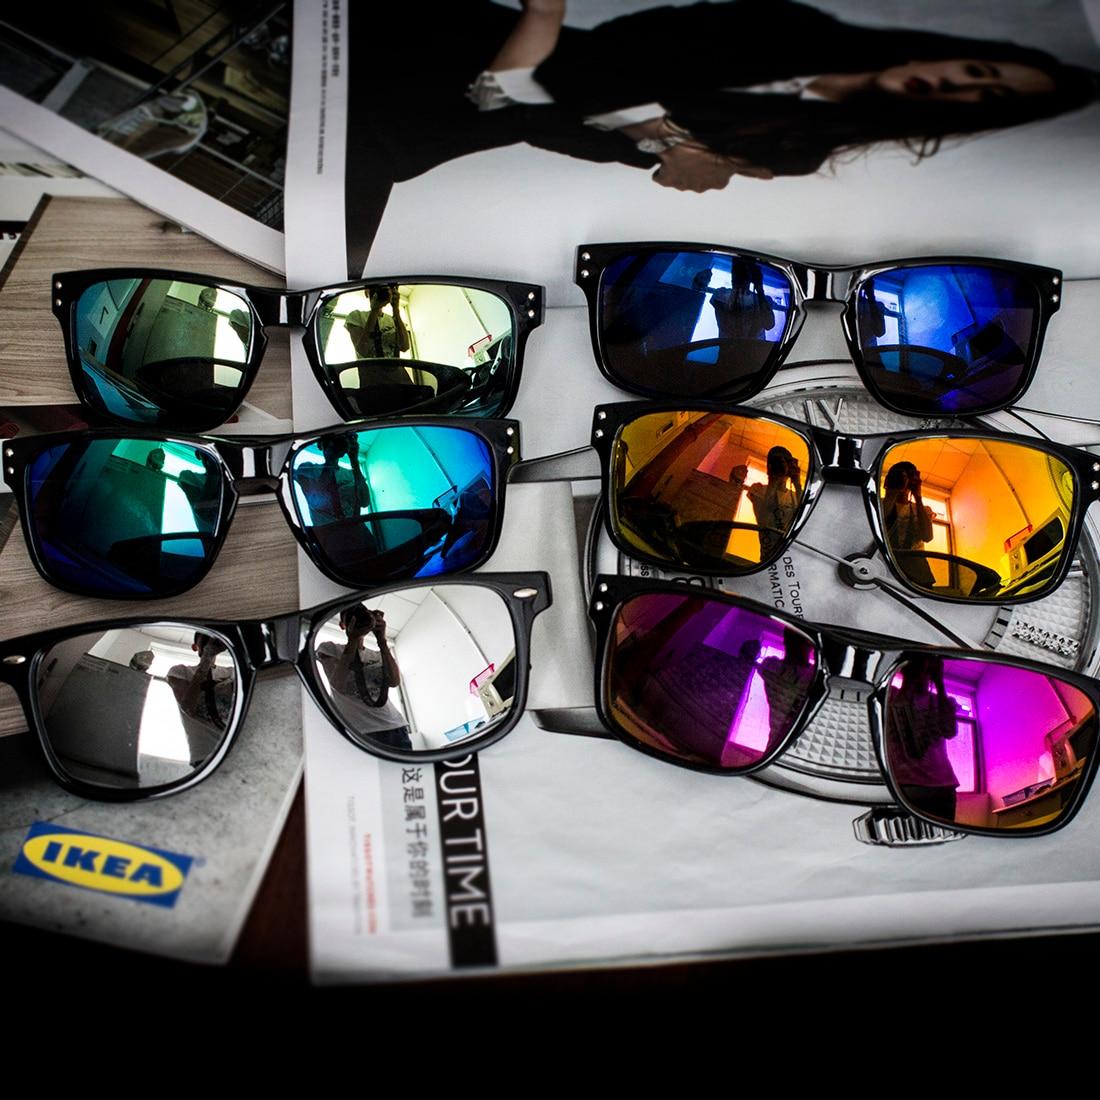 Fashionable Sunglasses Men Reflective Sports Sun Glasses Outdoors Square Eyewear Gafas De Sol Oculos De Sol Feminino